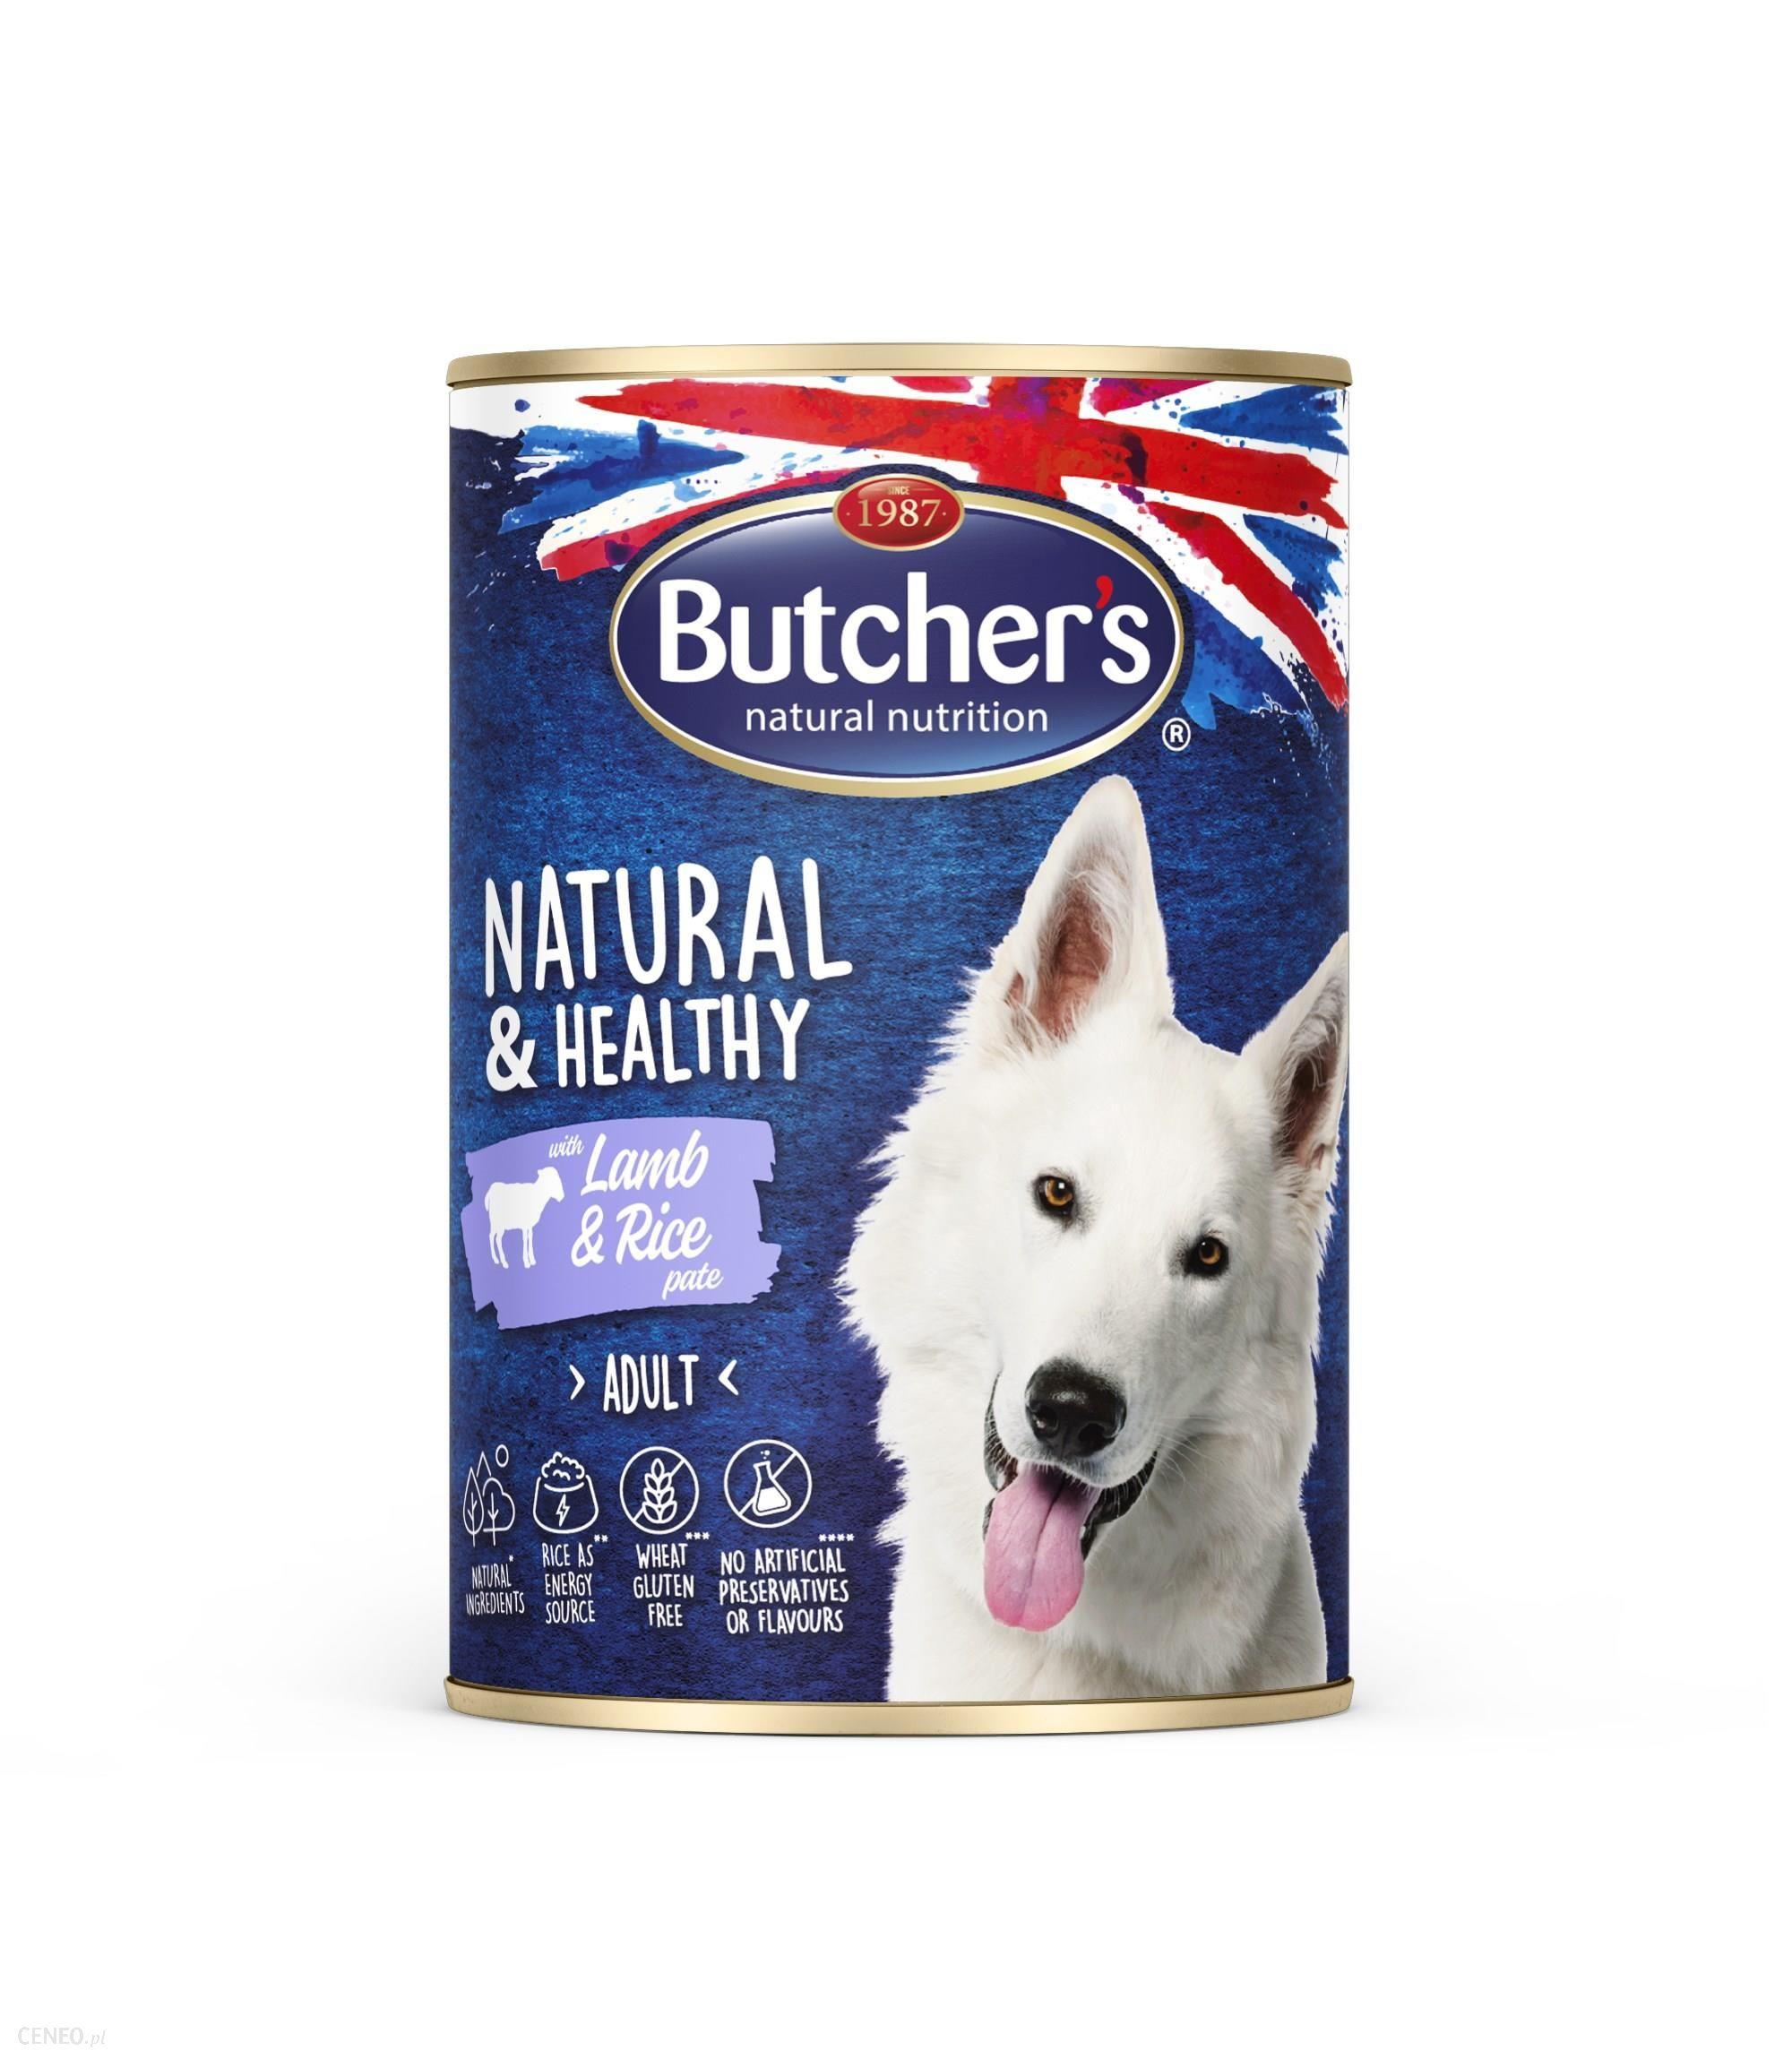 Butcher's Natural&Healthy Dog z jagnięciną i ryżem pasztet 6x390g